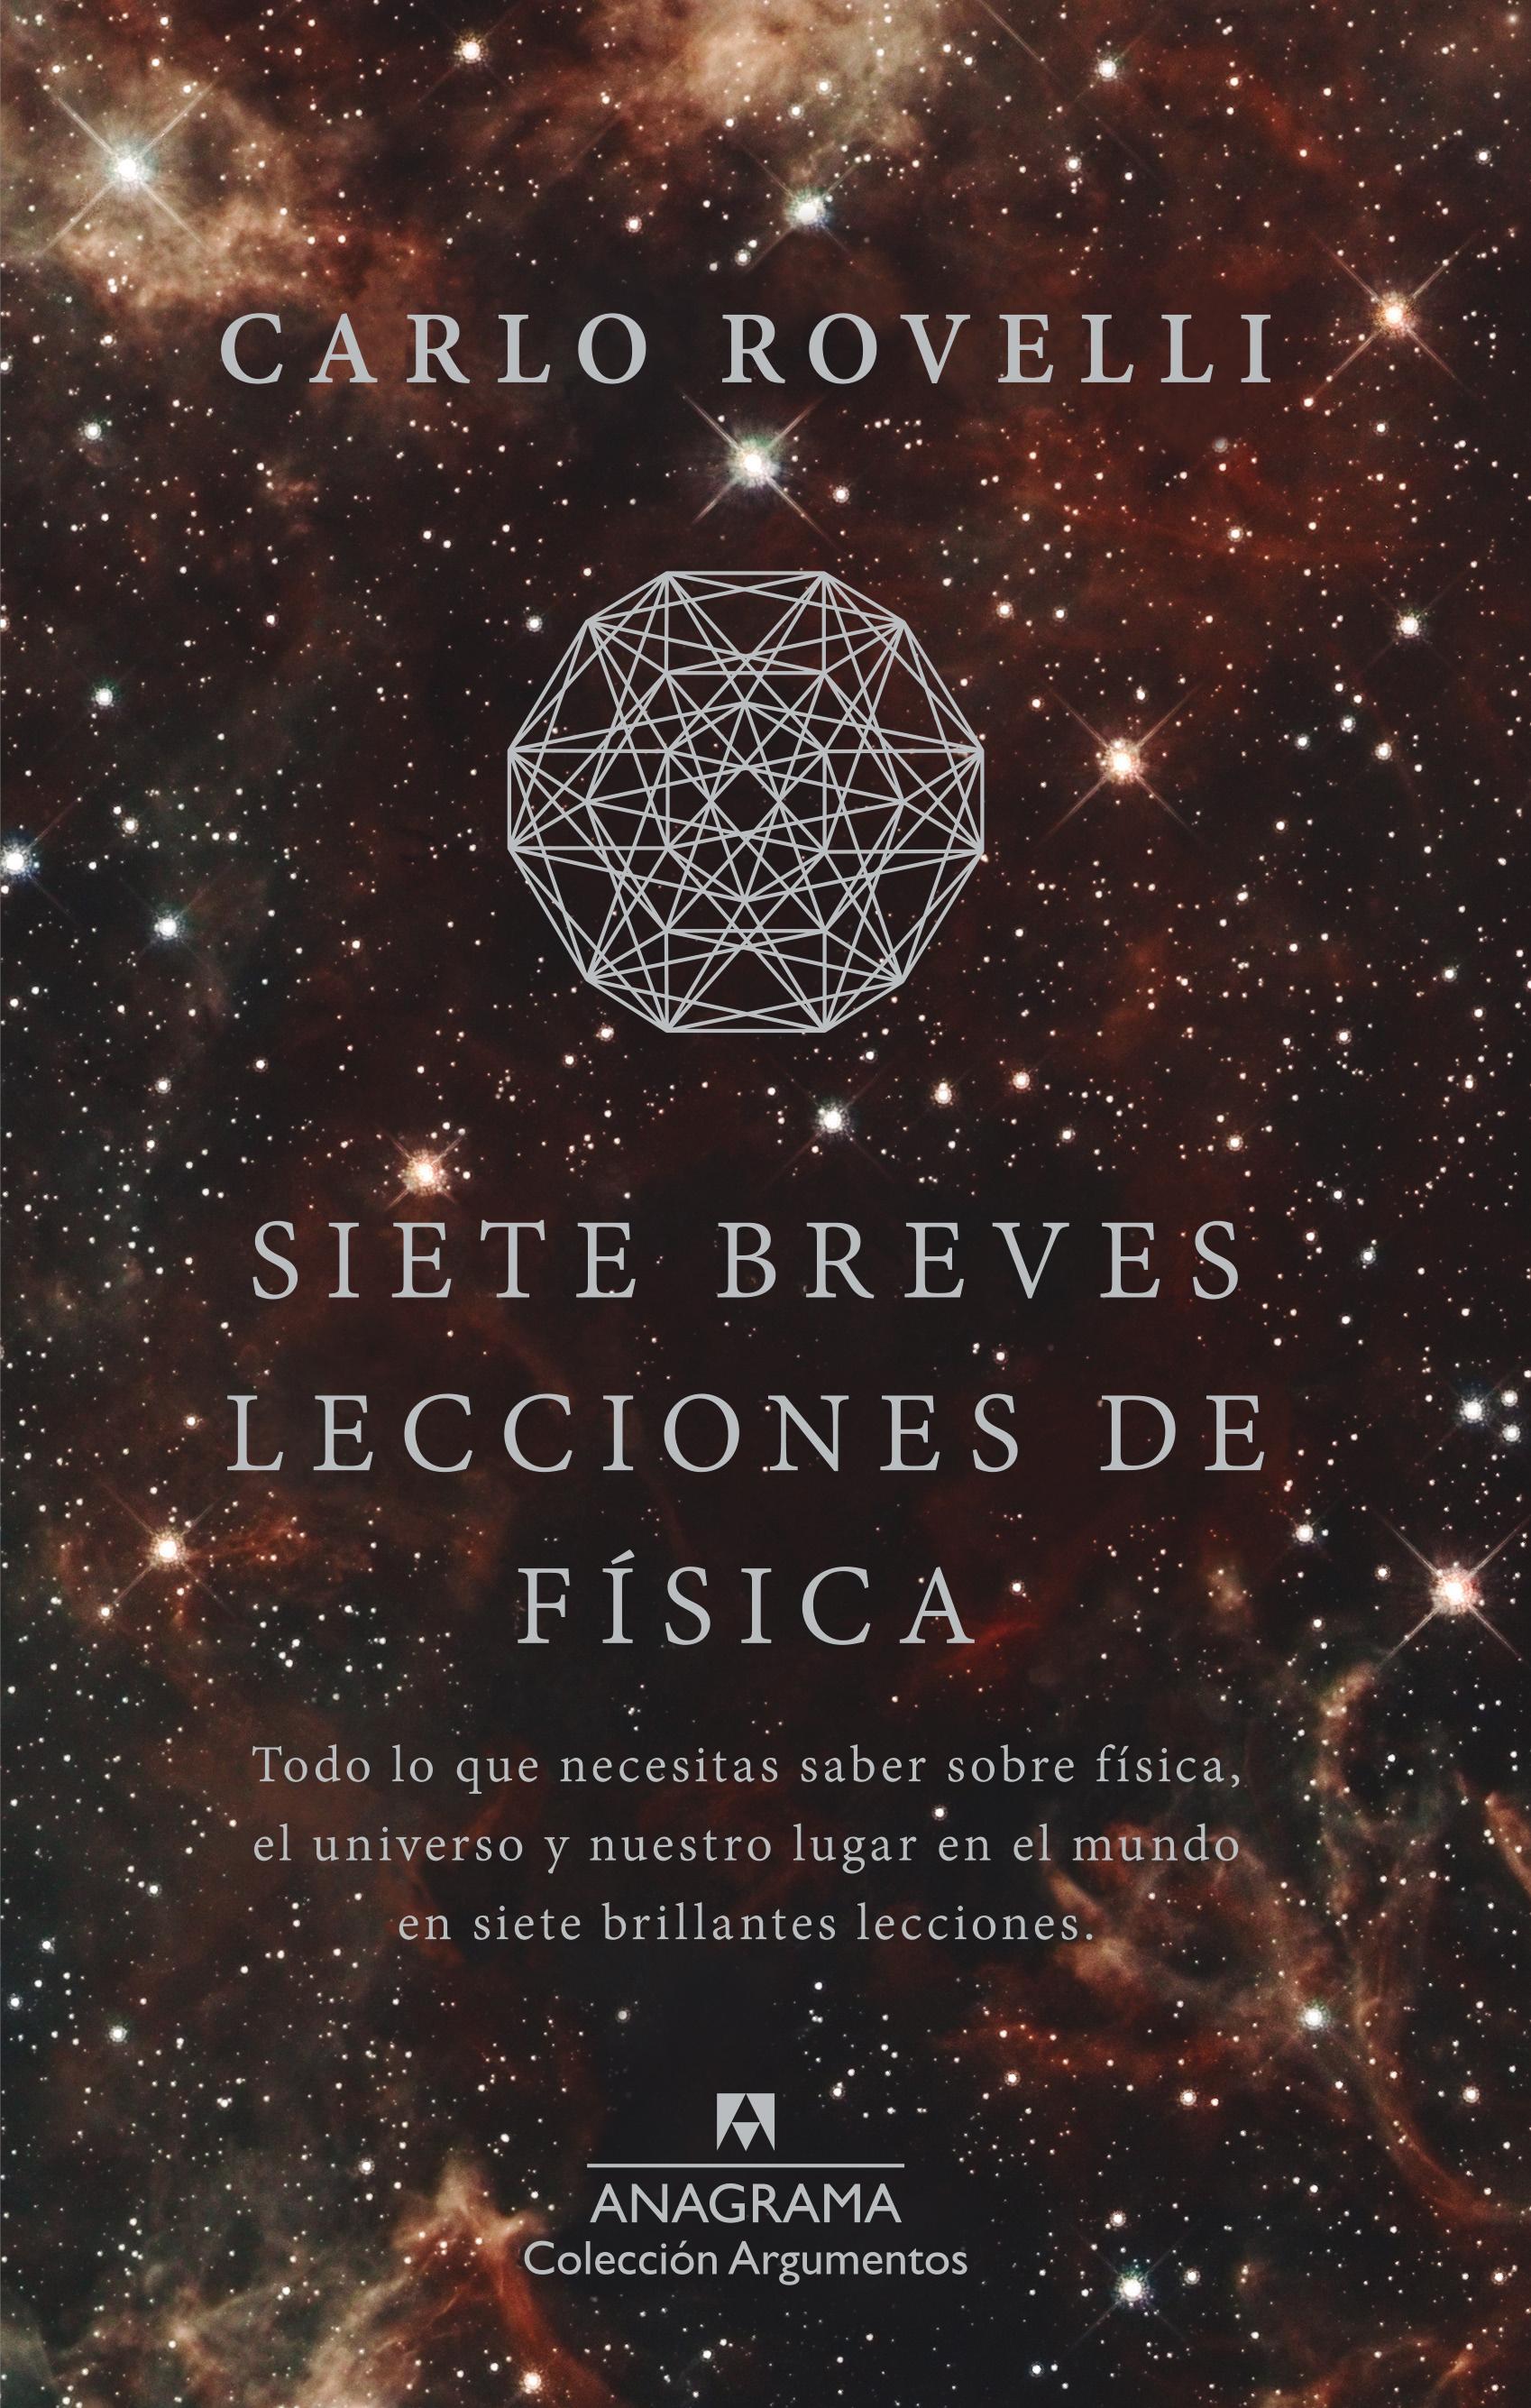 Siete breves lecciones de física - Rovelli, Carlo - 978-84-339-6400-7 -  Editorial Anagrama